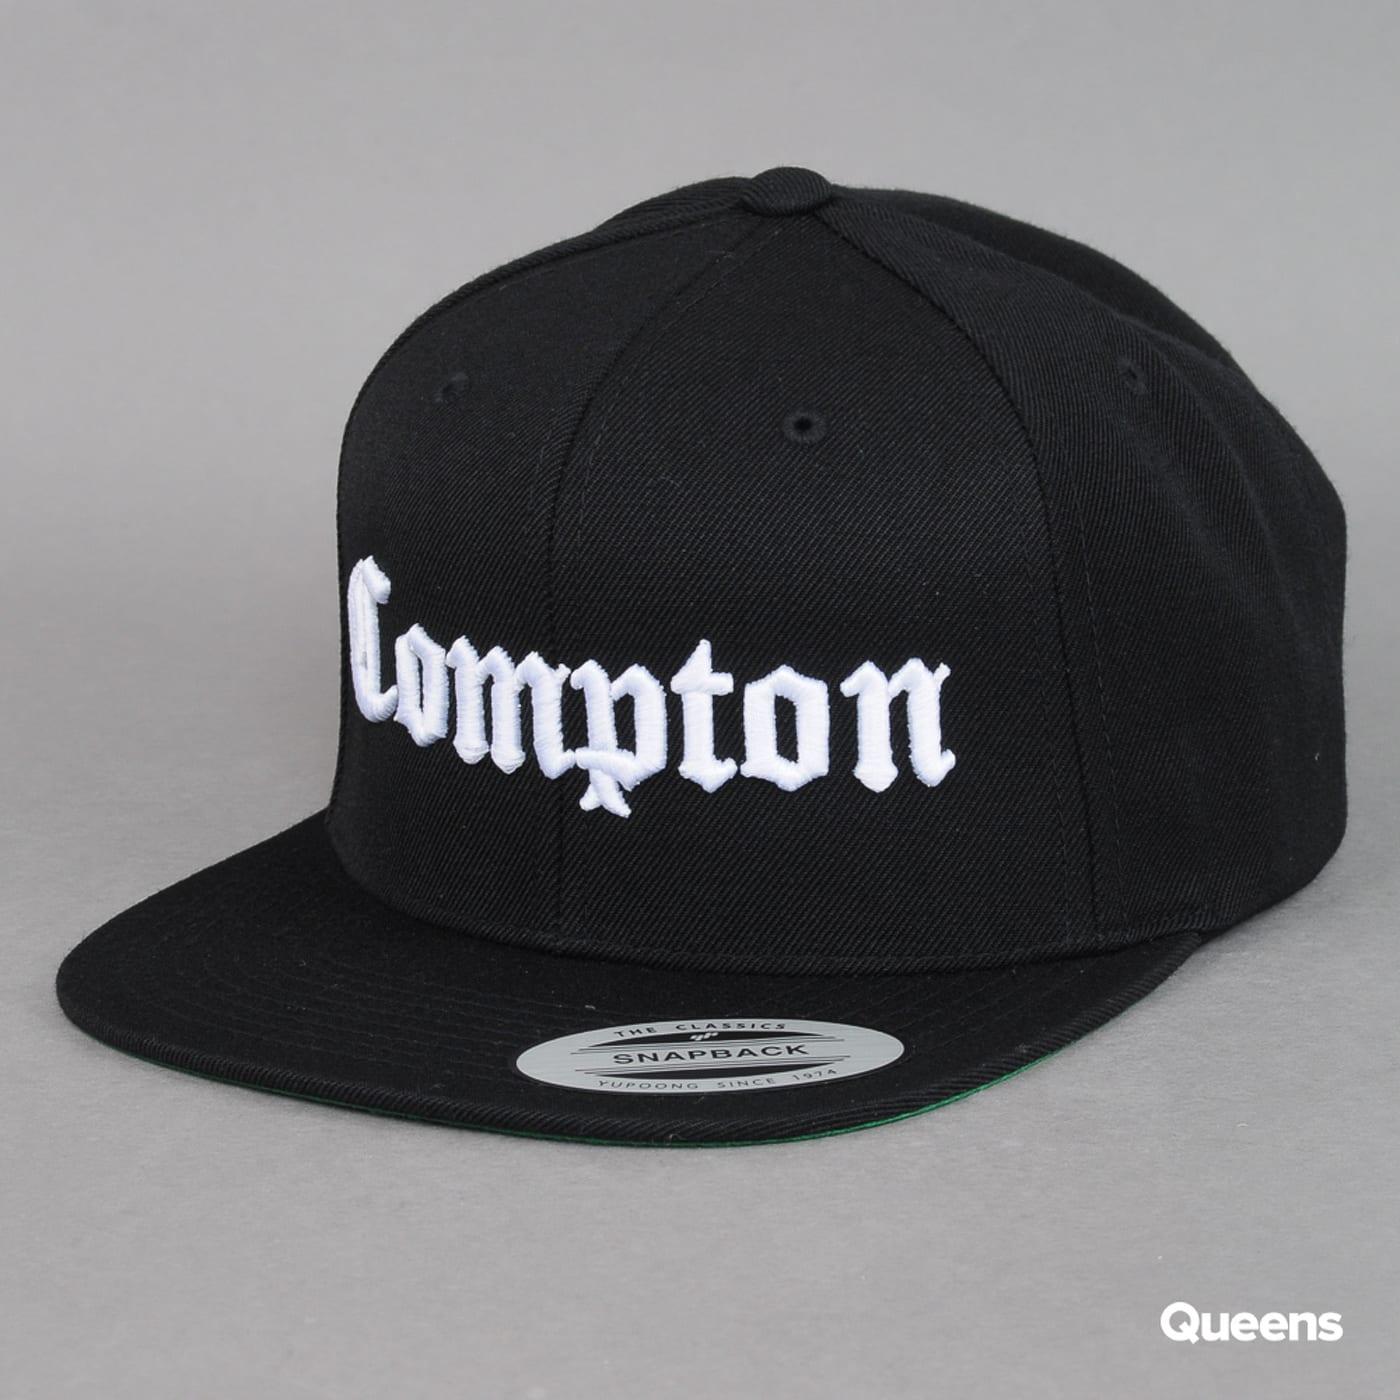 Yupoong Compton Cap schwarz / weiß